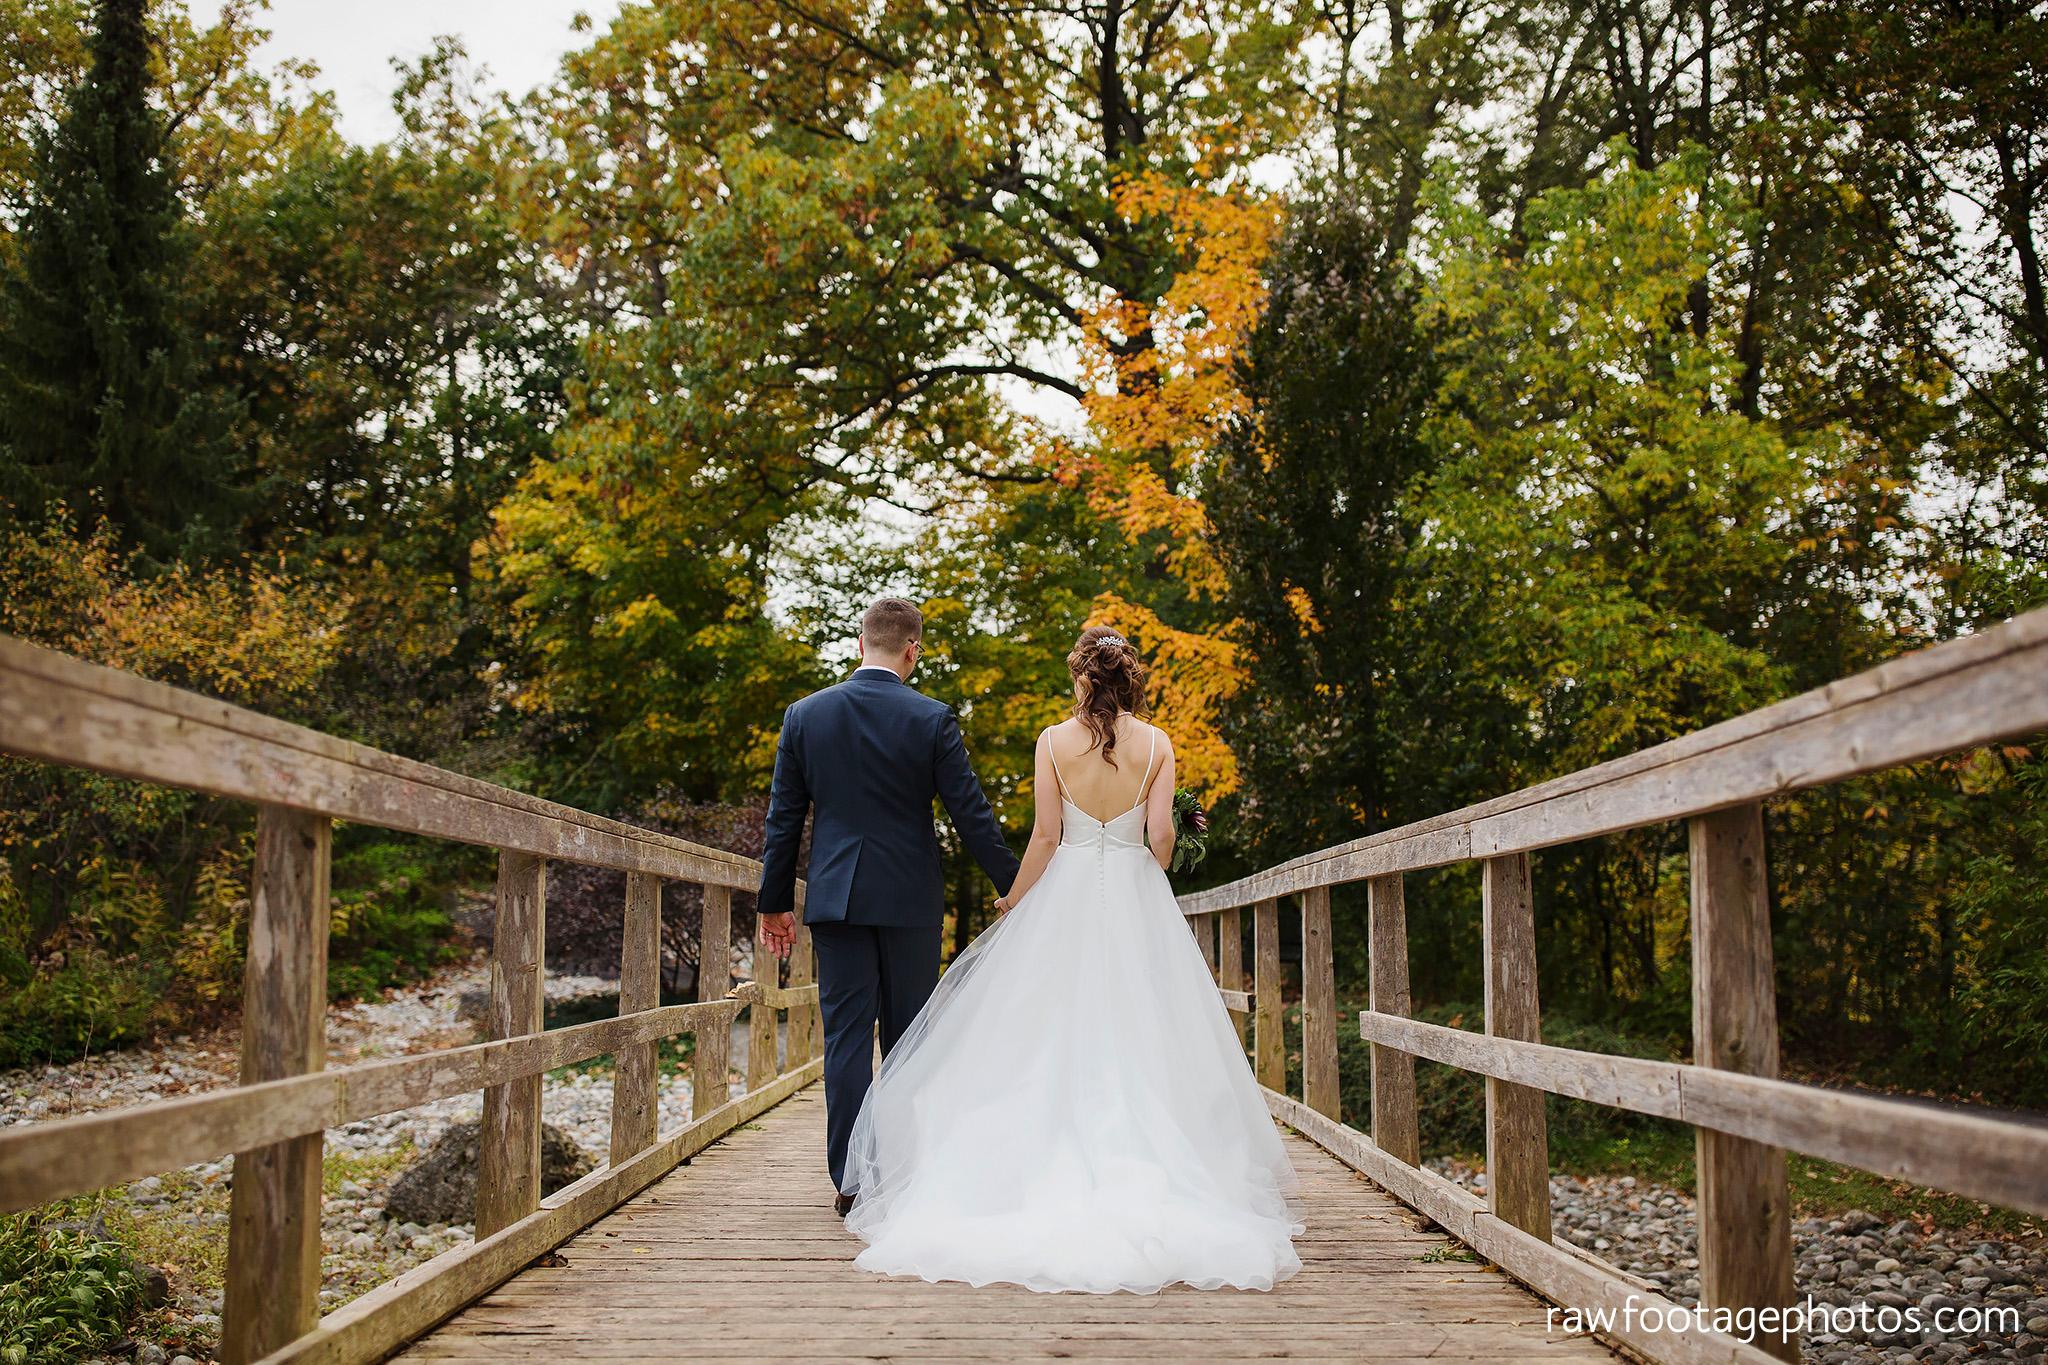 london_ontario_wedding_photographer-civic_gardens-springbank_park-succulent_bouquet-fall_wedding-bridge-raw_footage_photography058.jpg